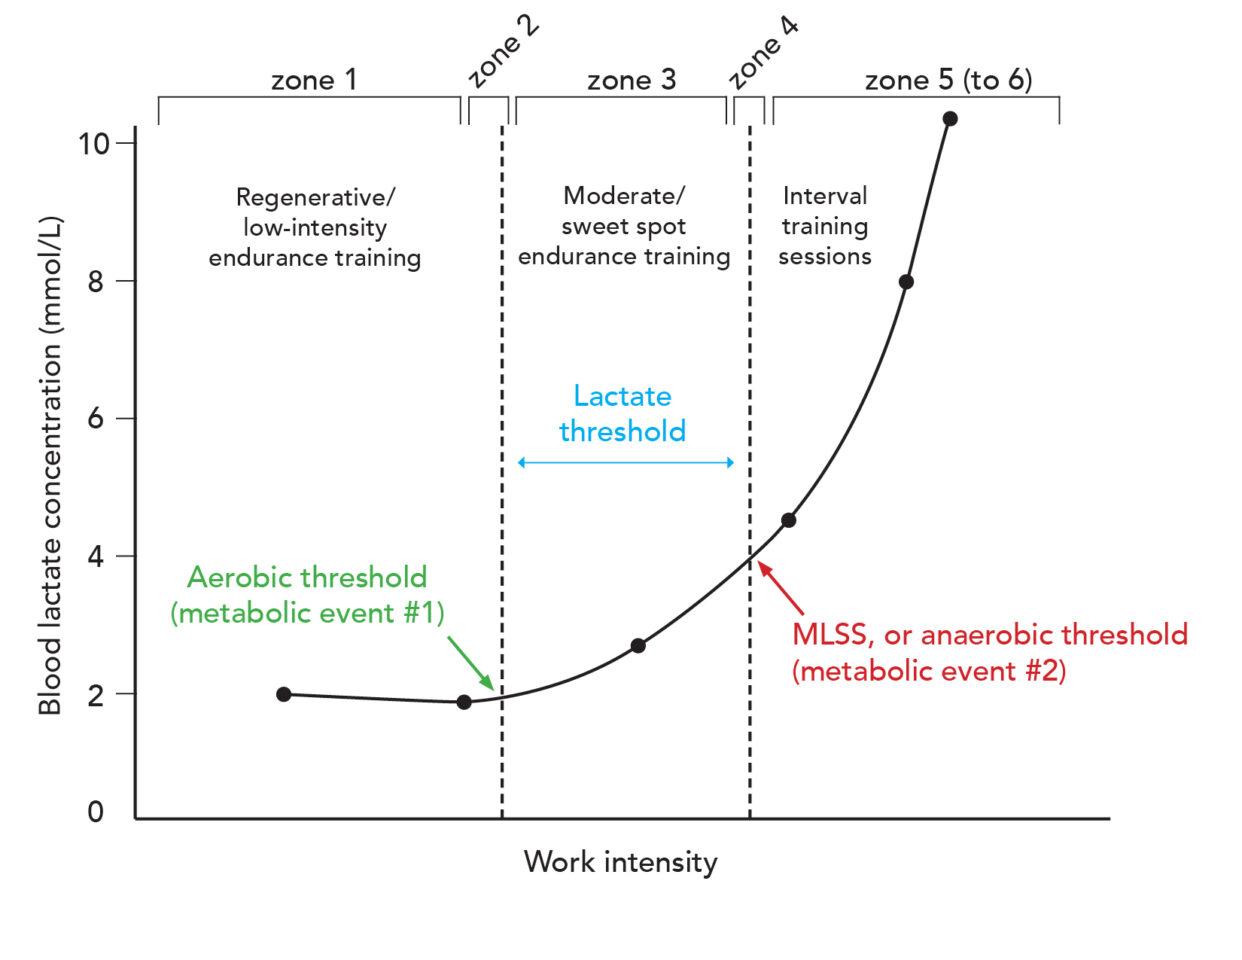 lactate-workload plot of thresholds